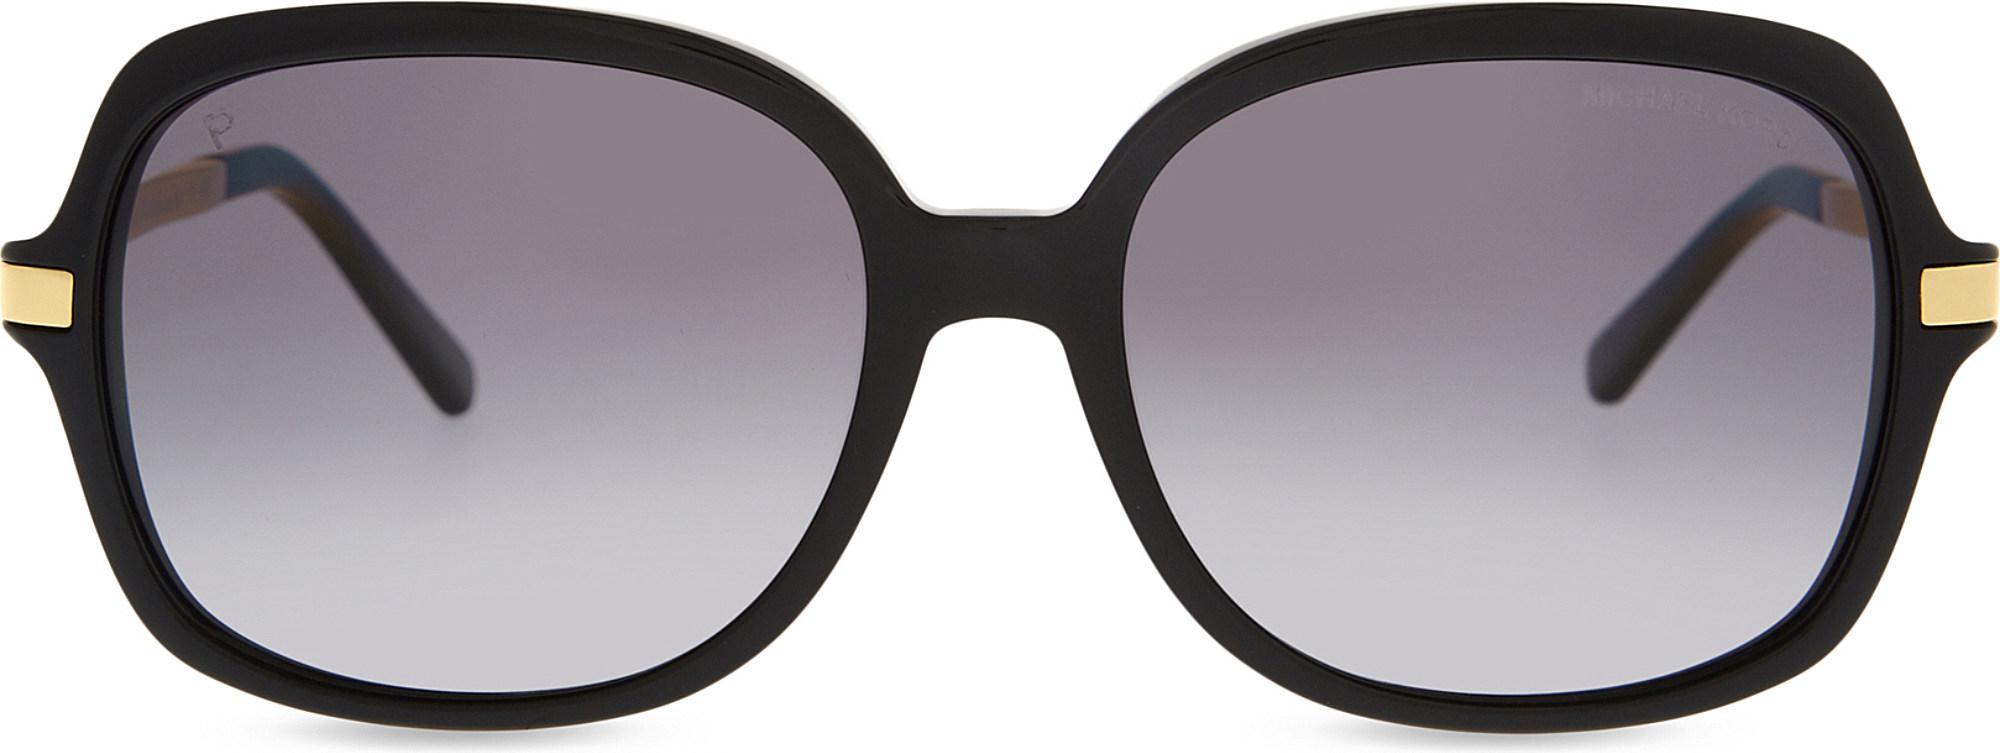 412428761a Lyst - Michael Kors Mk2024 Adrianna Ii Square-frame Sunglasses in Black